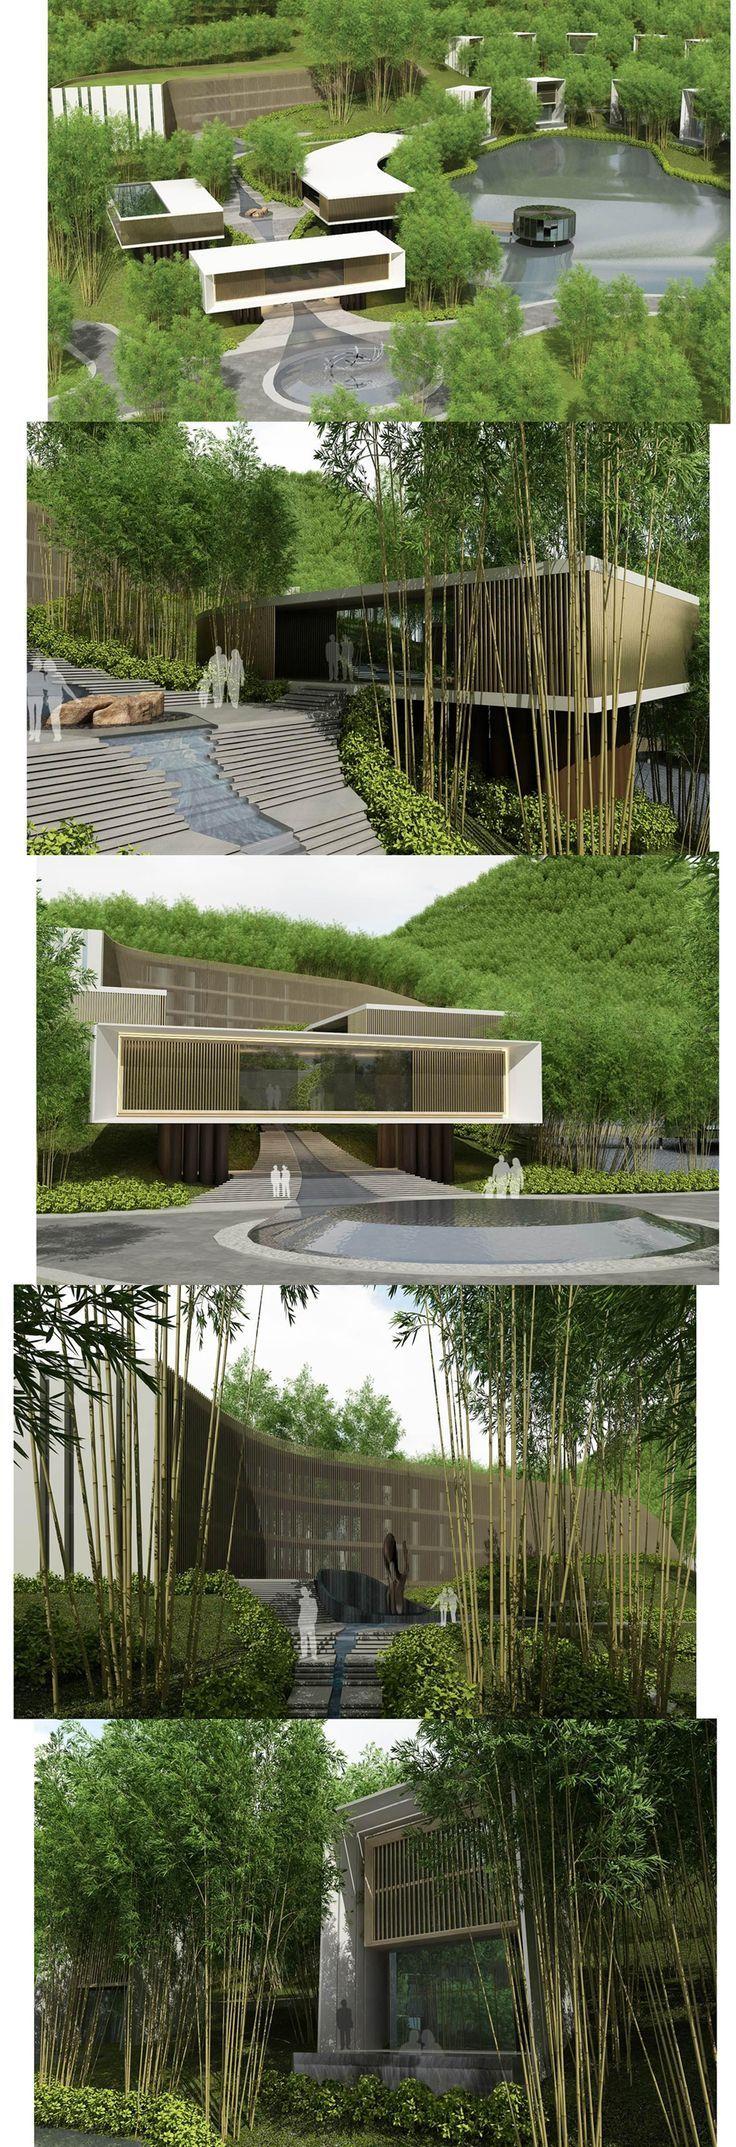 Architecture_Bamboo Resort Hotel_3d_Visualization!